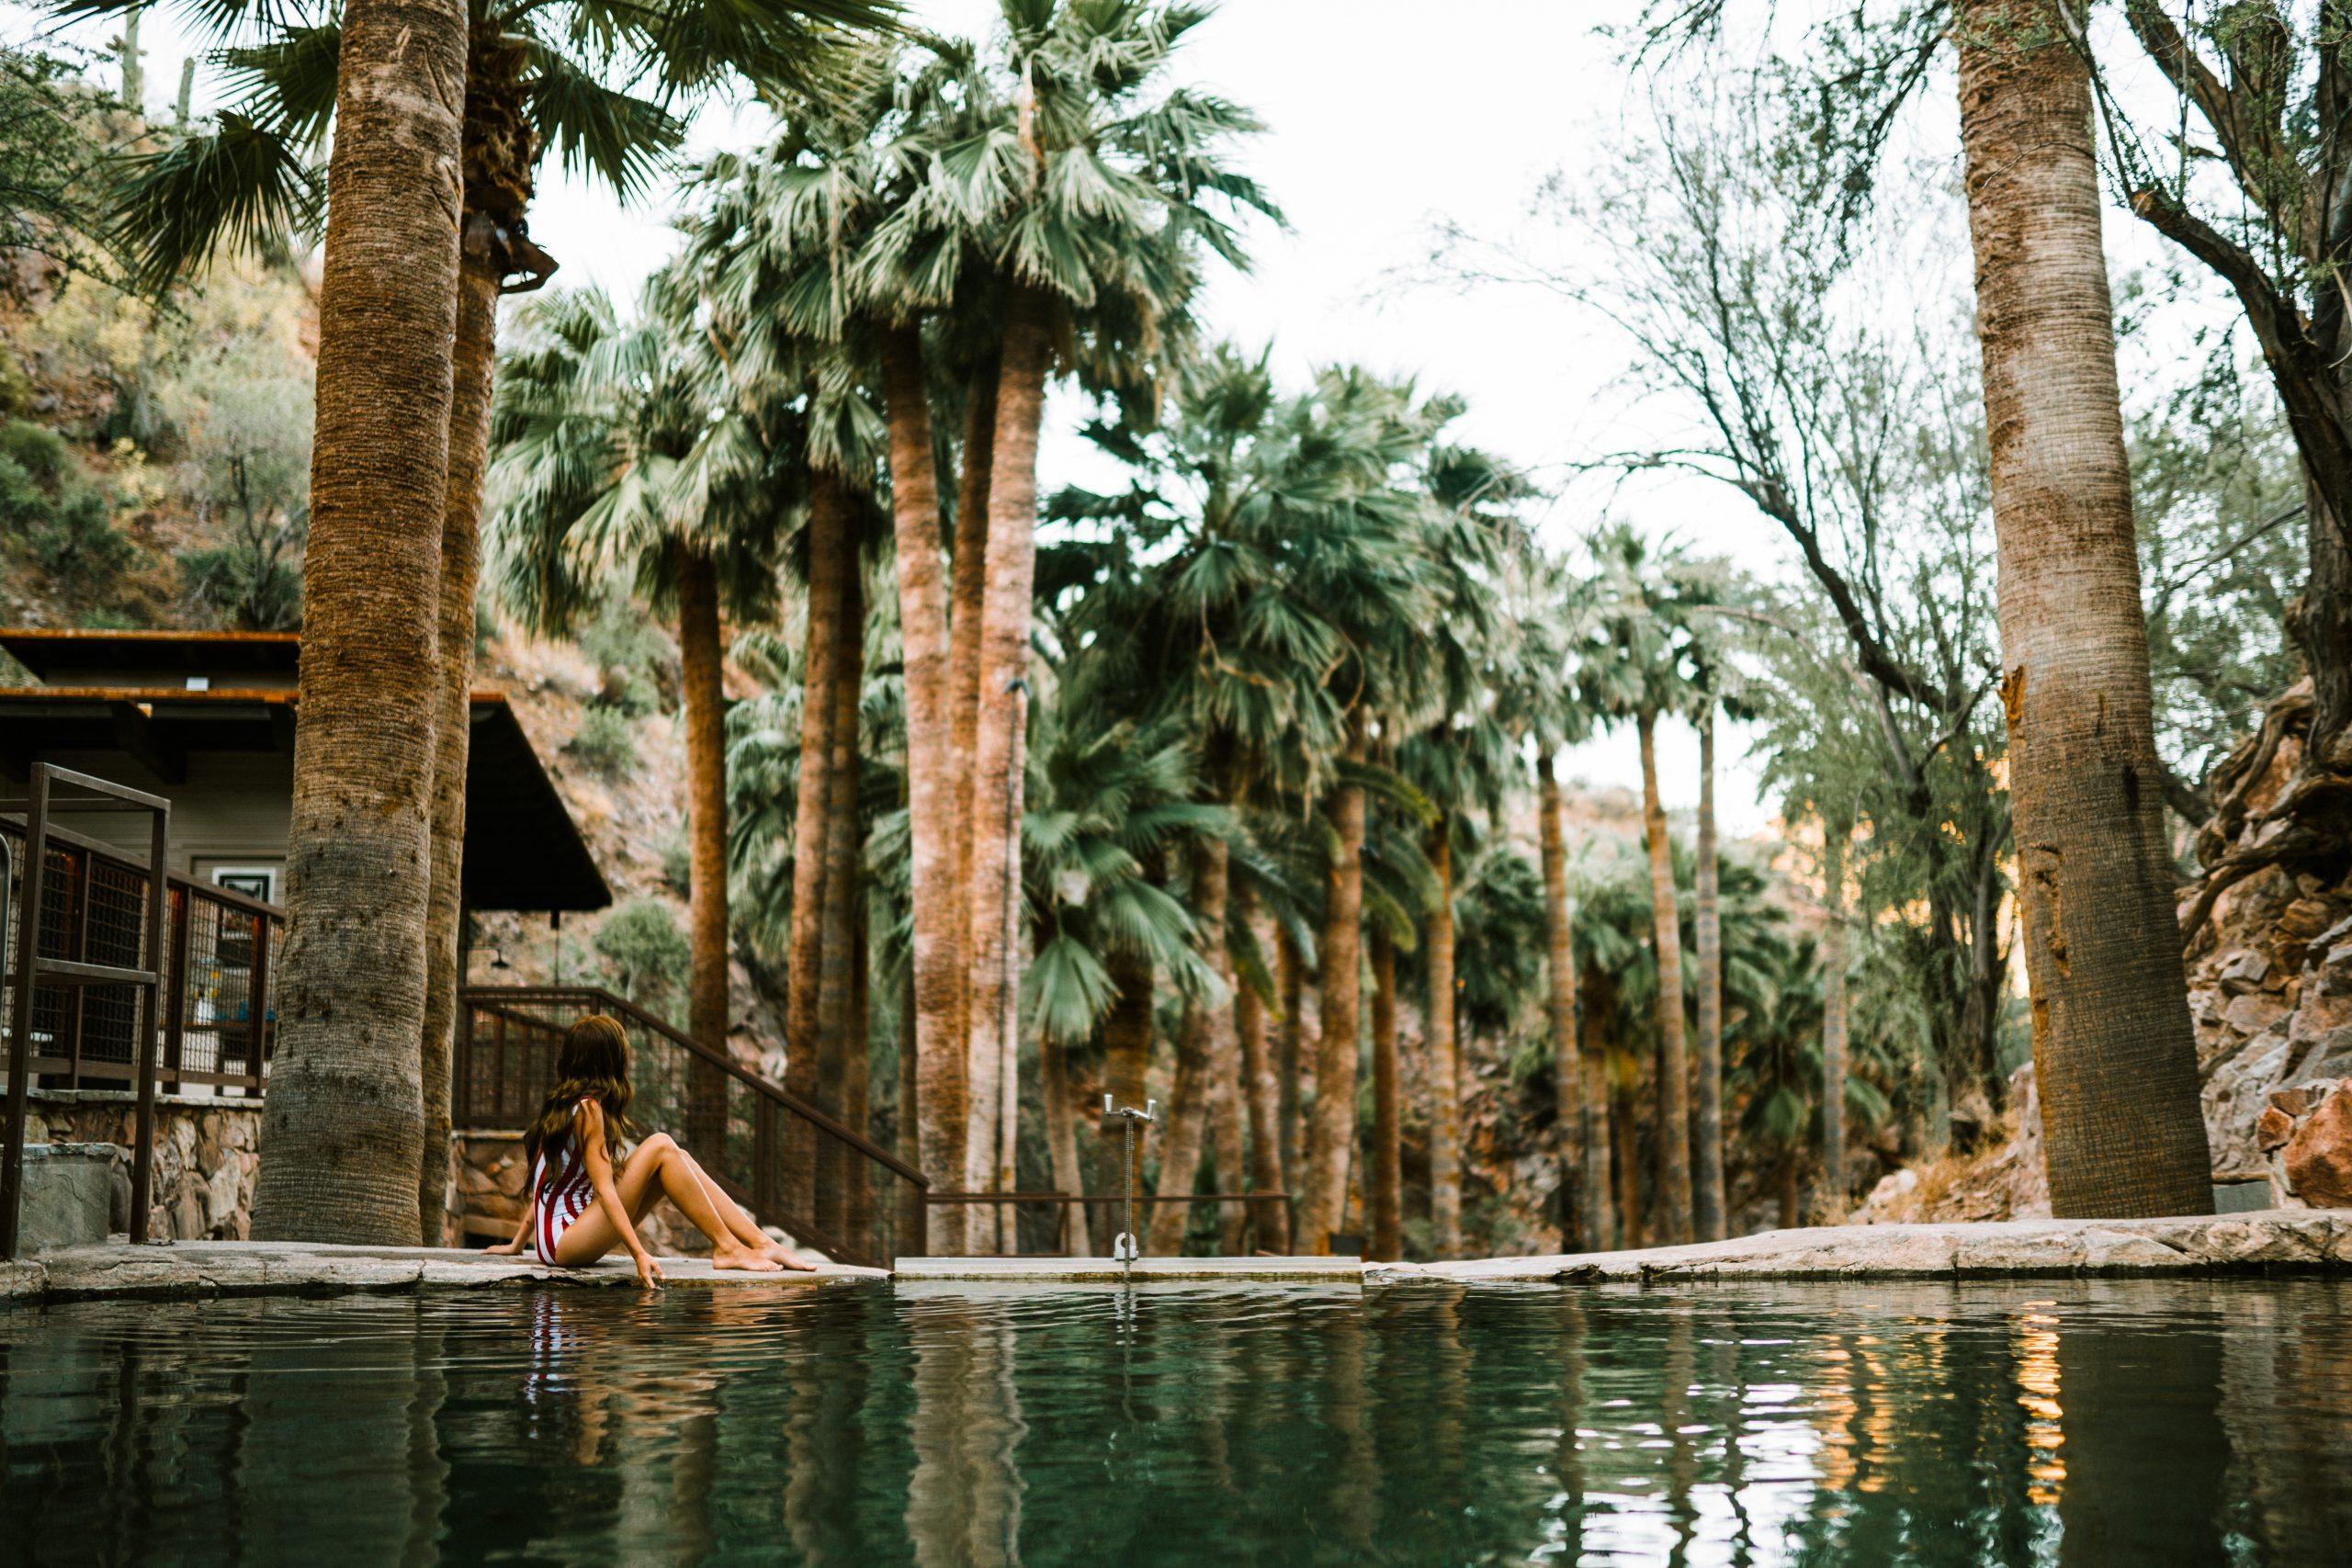 Castle Hot Springs in the Sonoran Desert, Arizona